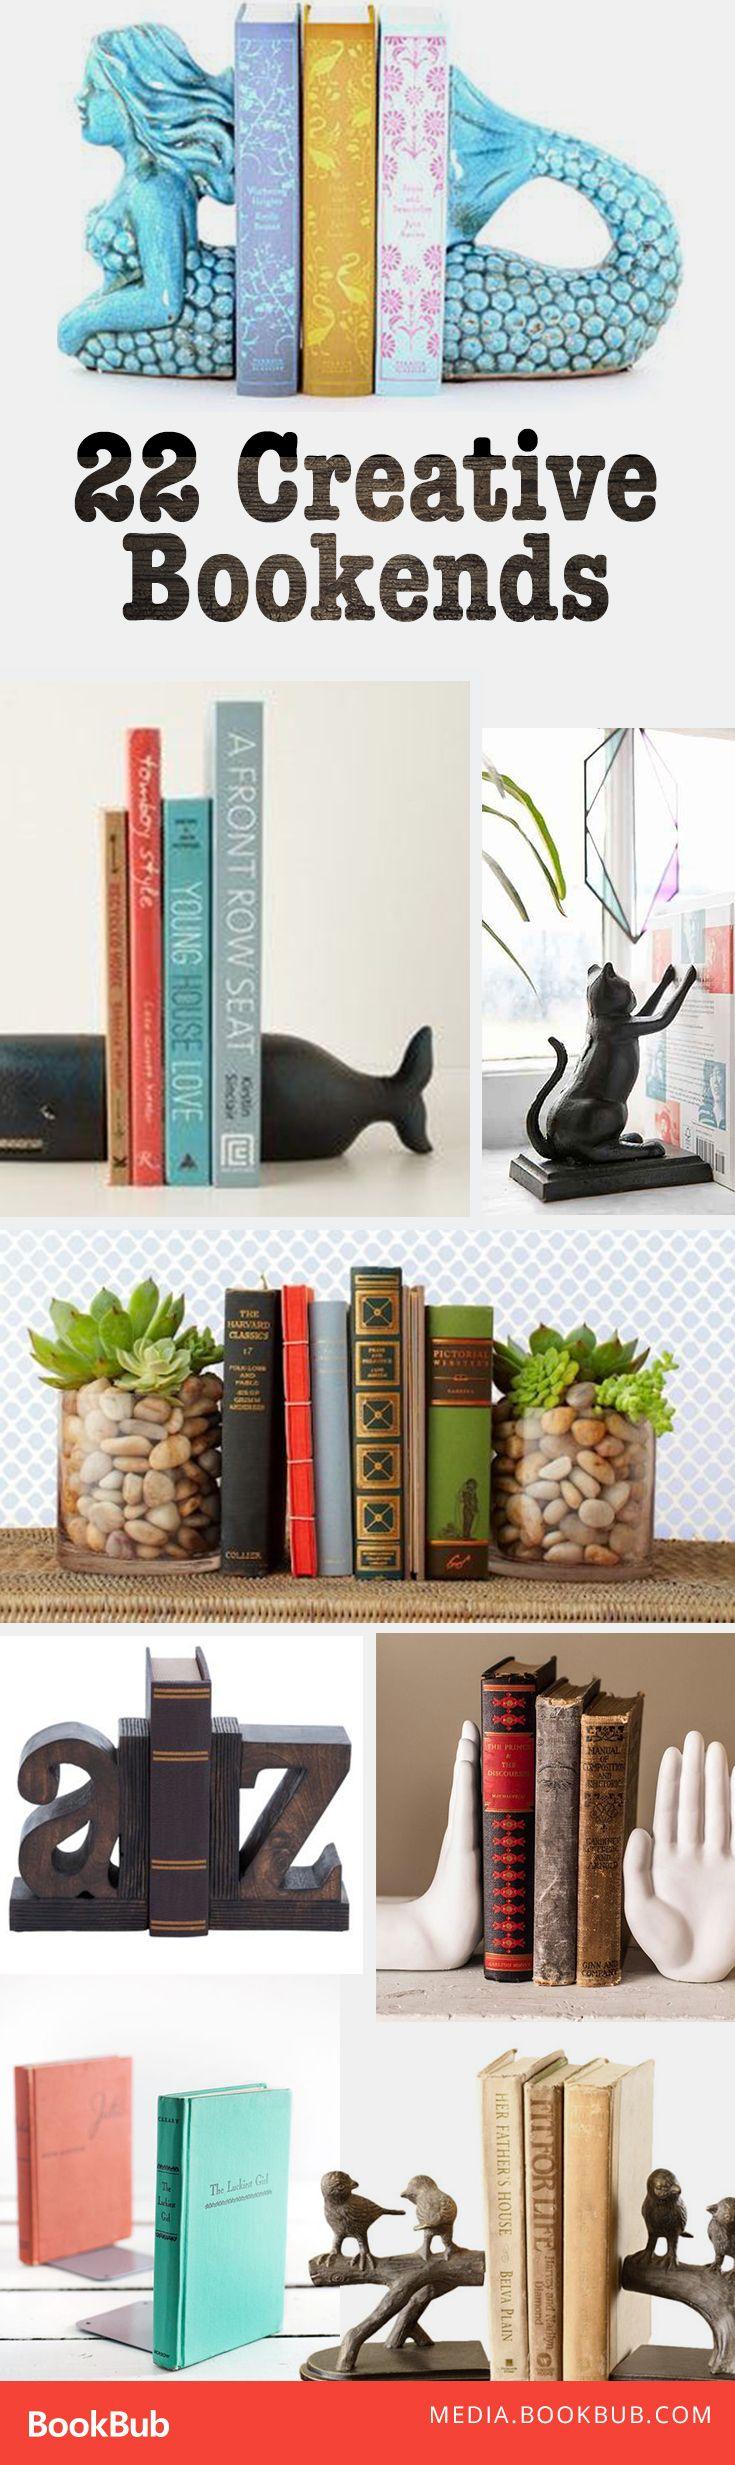 My Dear Books!  Http://www.designswan.com/wp Content/uploads/2009/lifeDesign/1/24 Için  Google Görsel Sonuçları | Book Stuff | Pinterest | Life Design